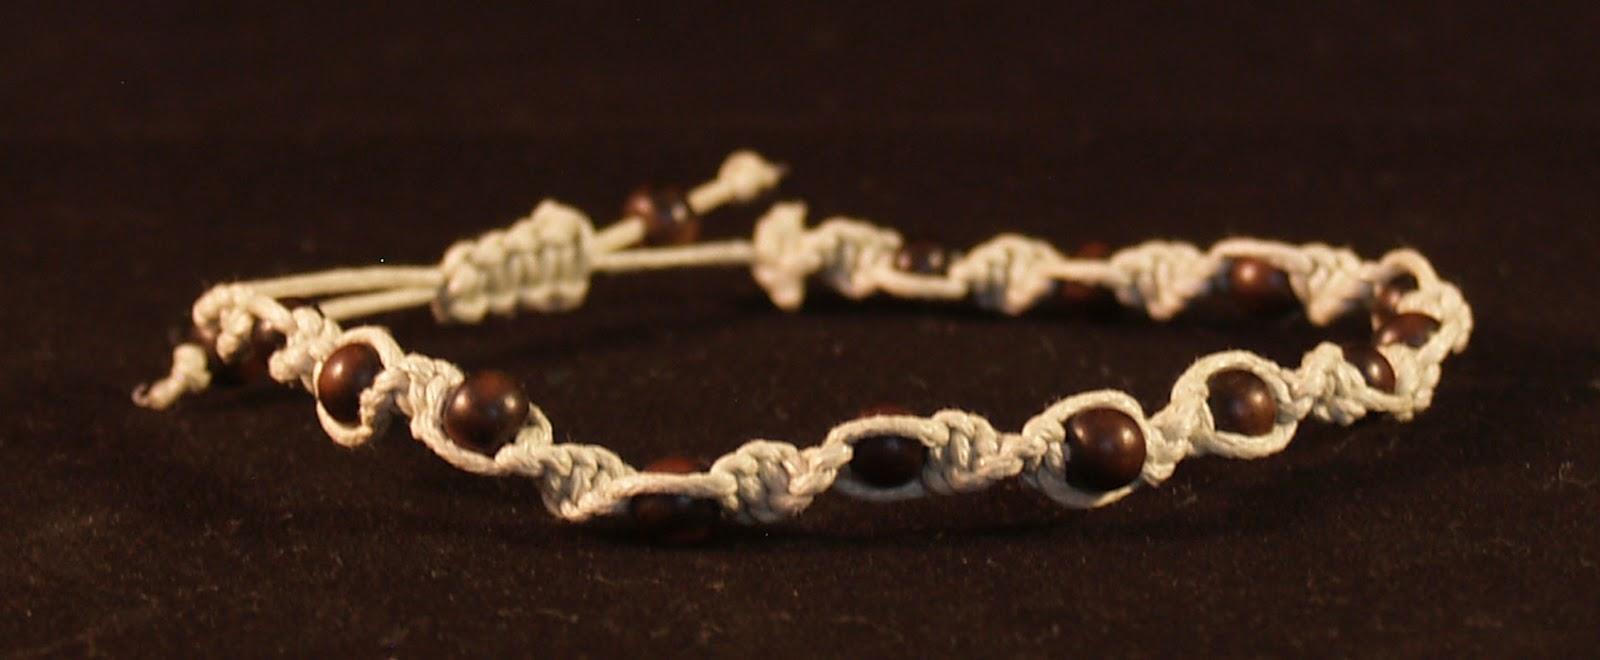 macrame bracelet natural